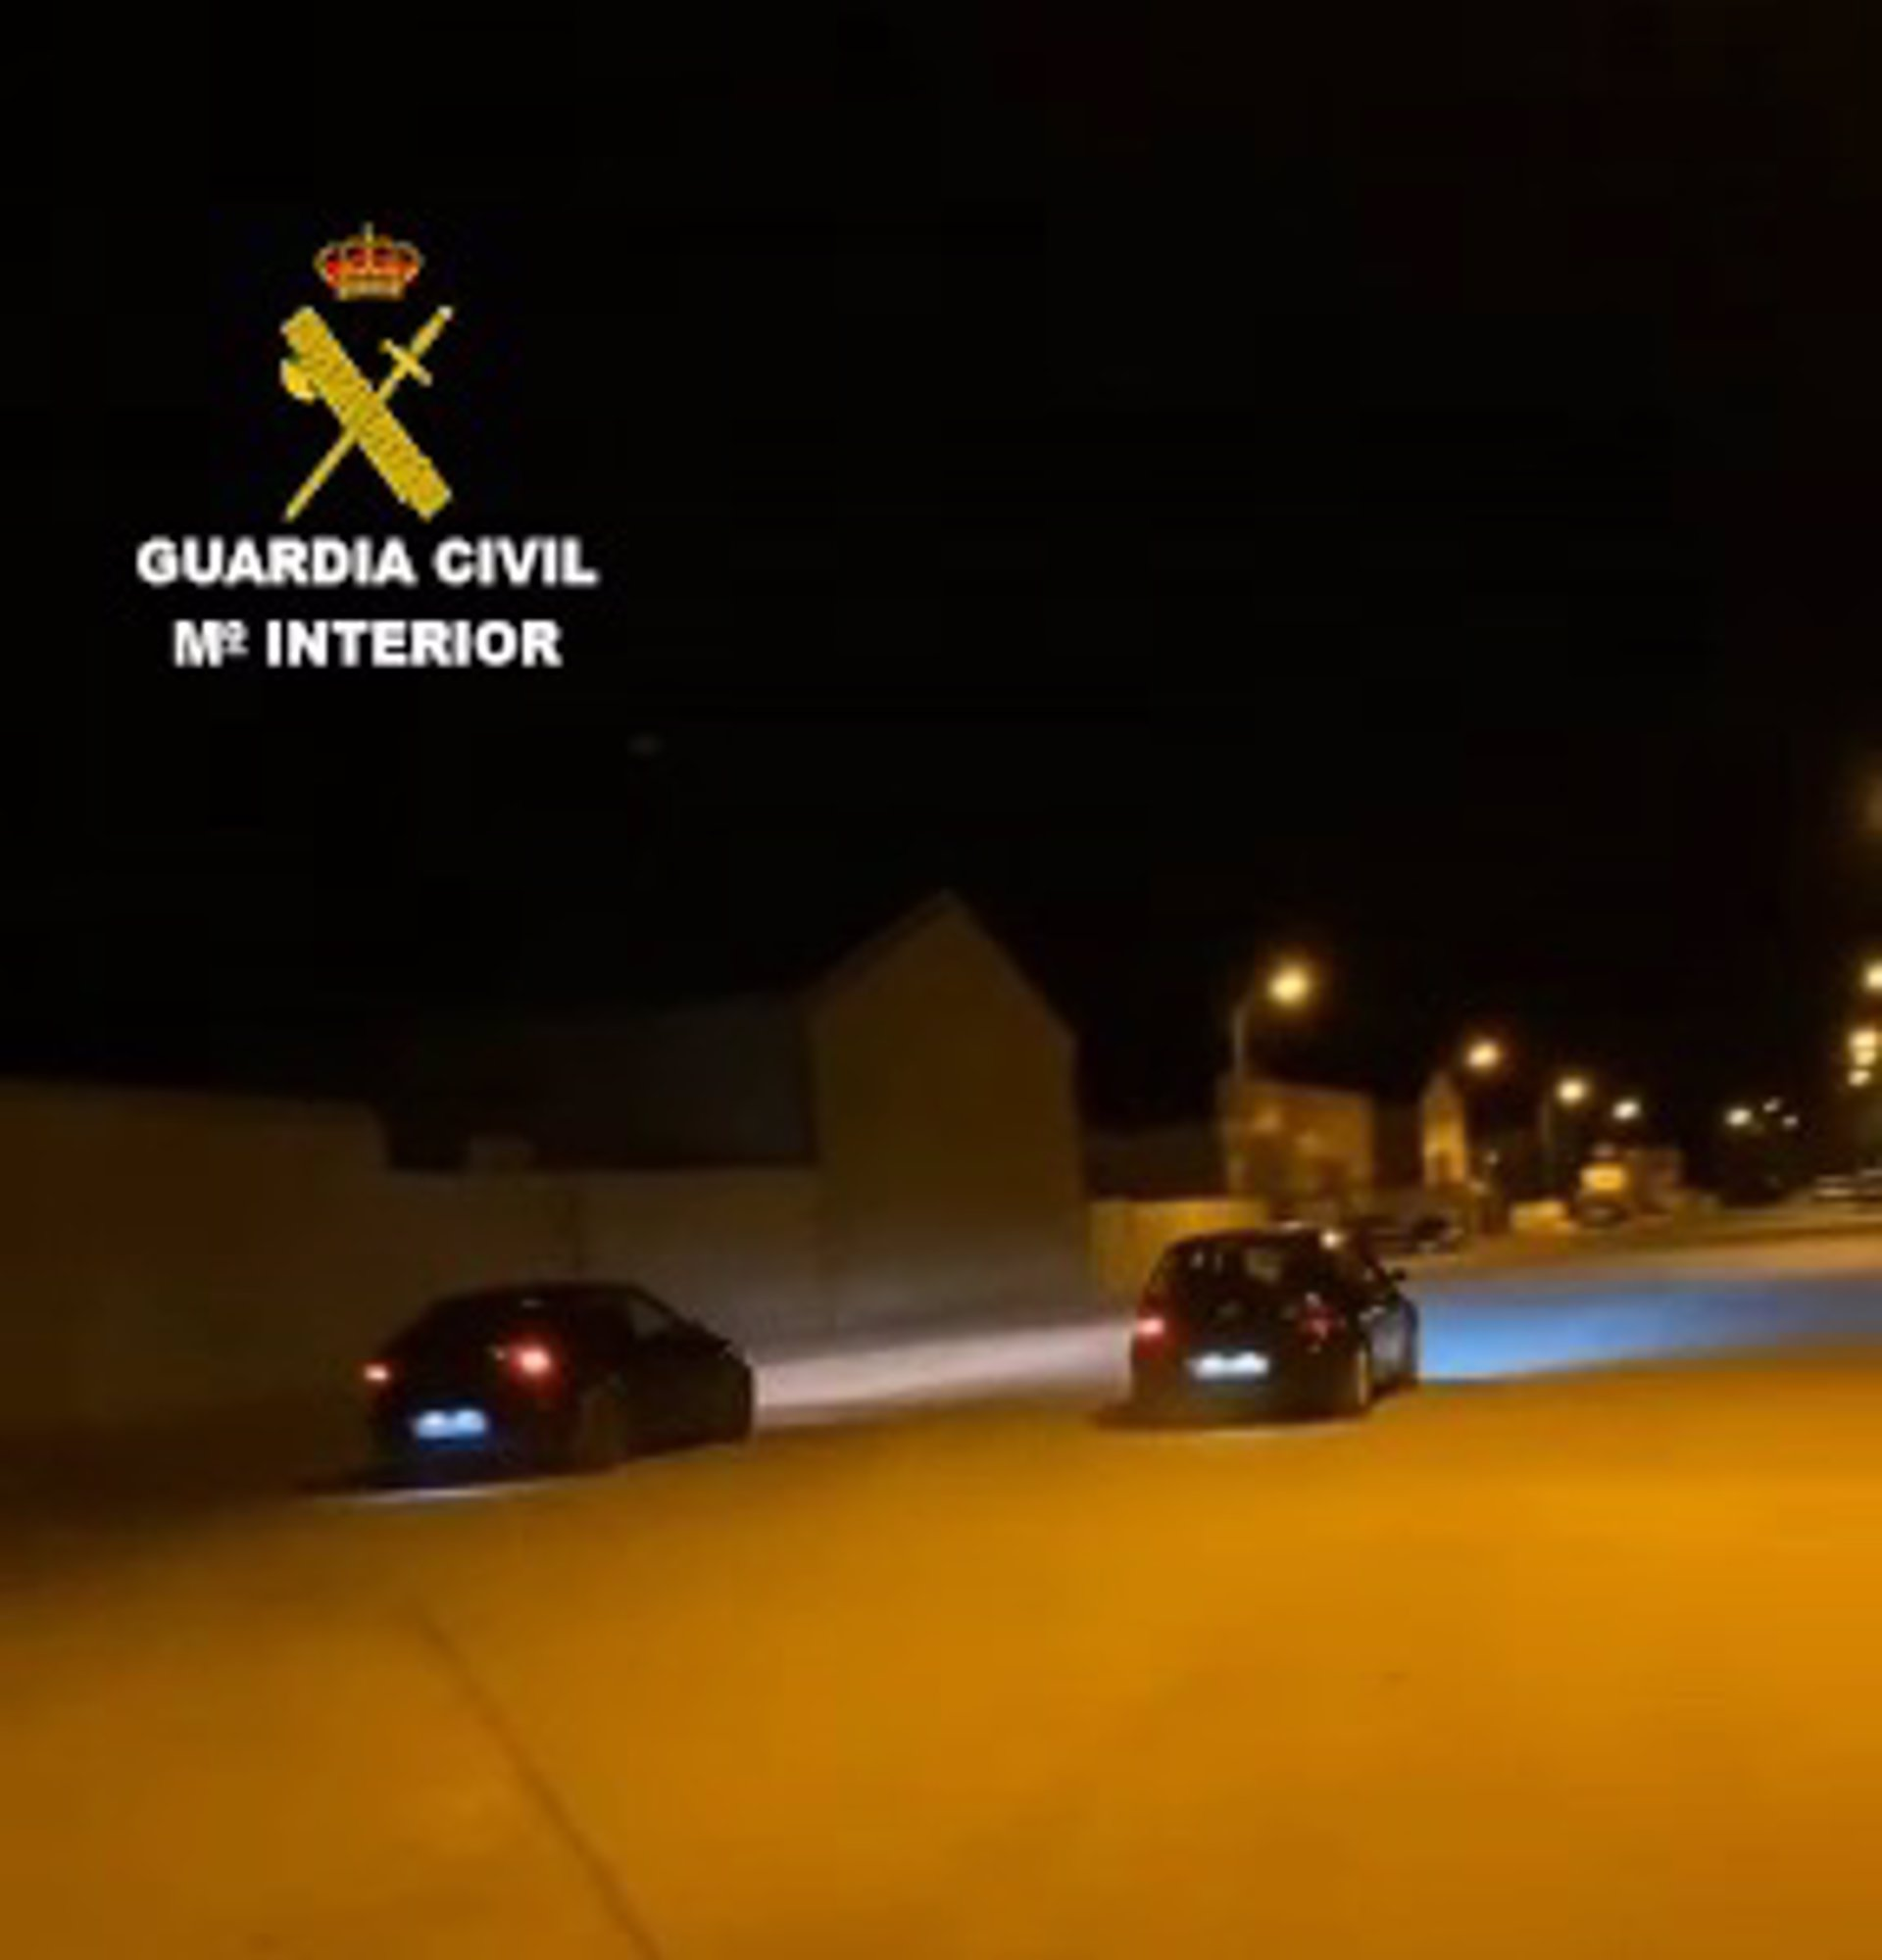 La Guardia Civil denuncia a los responsables de una carrera ilegal de coches en un polígono de Huéscar